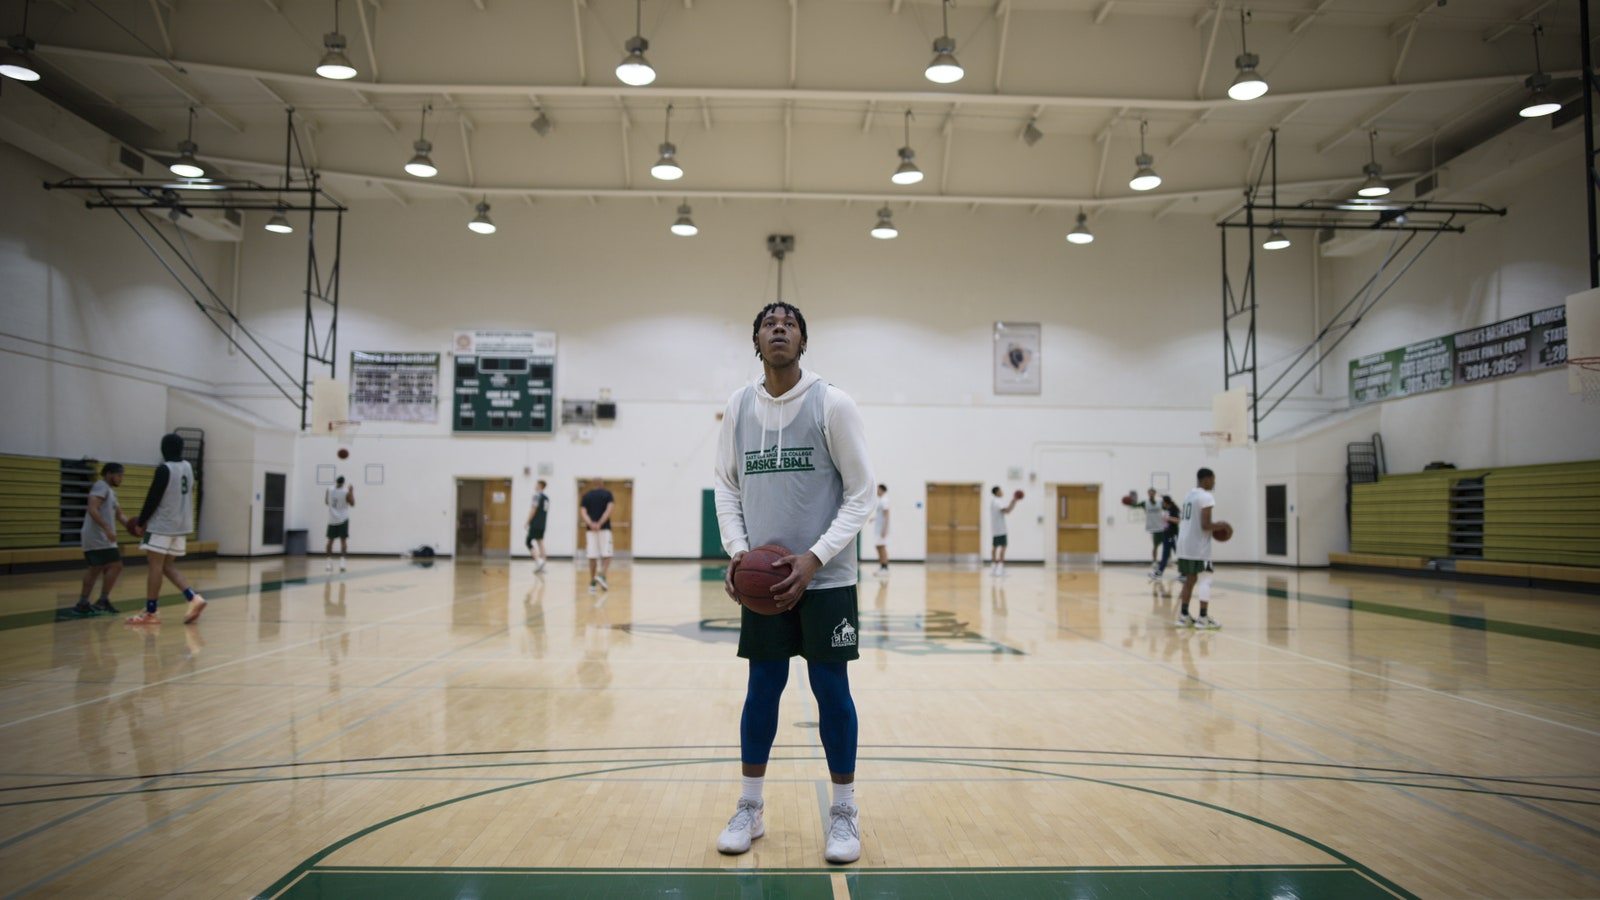 Last Chance U: Basketball Episode 1